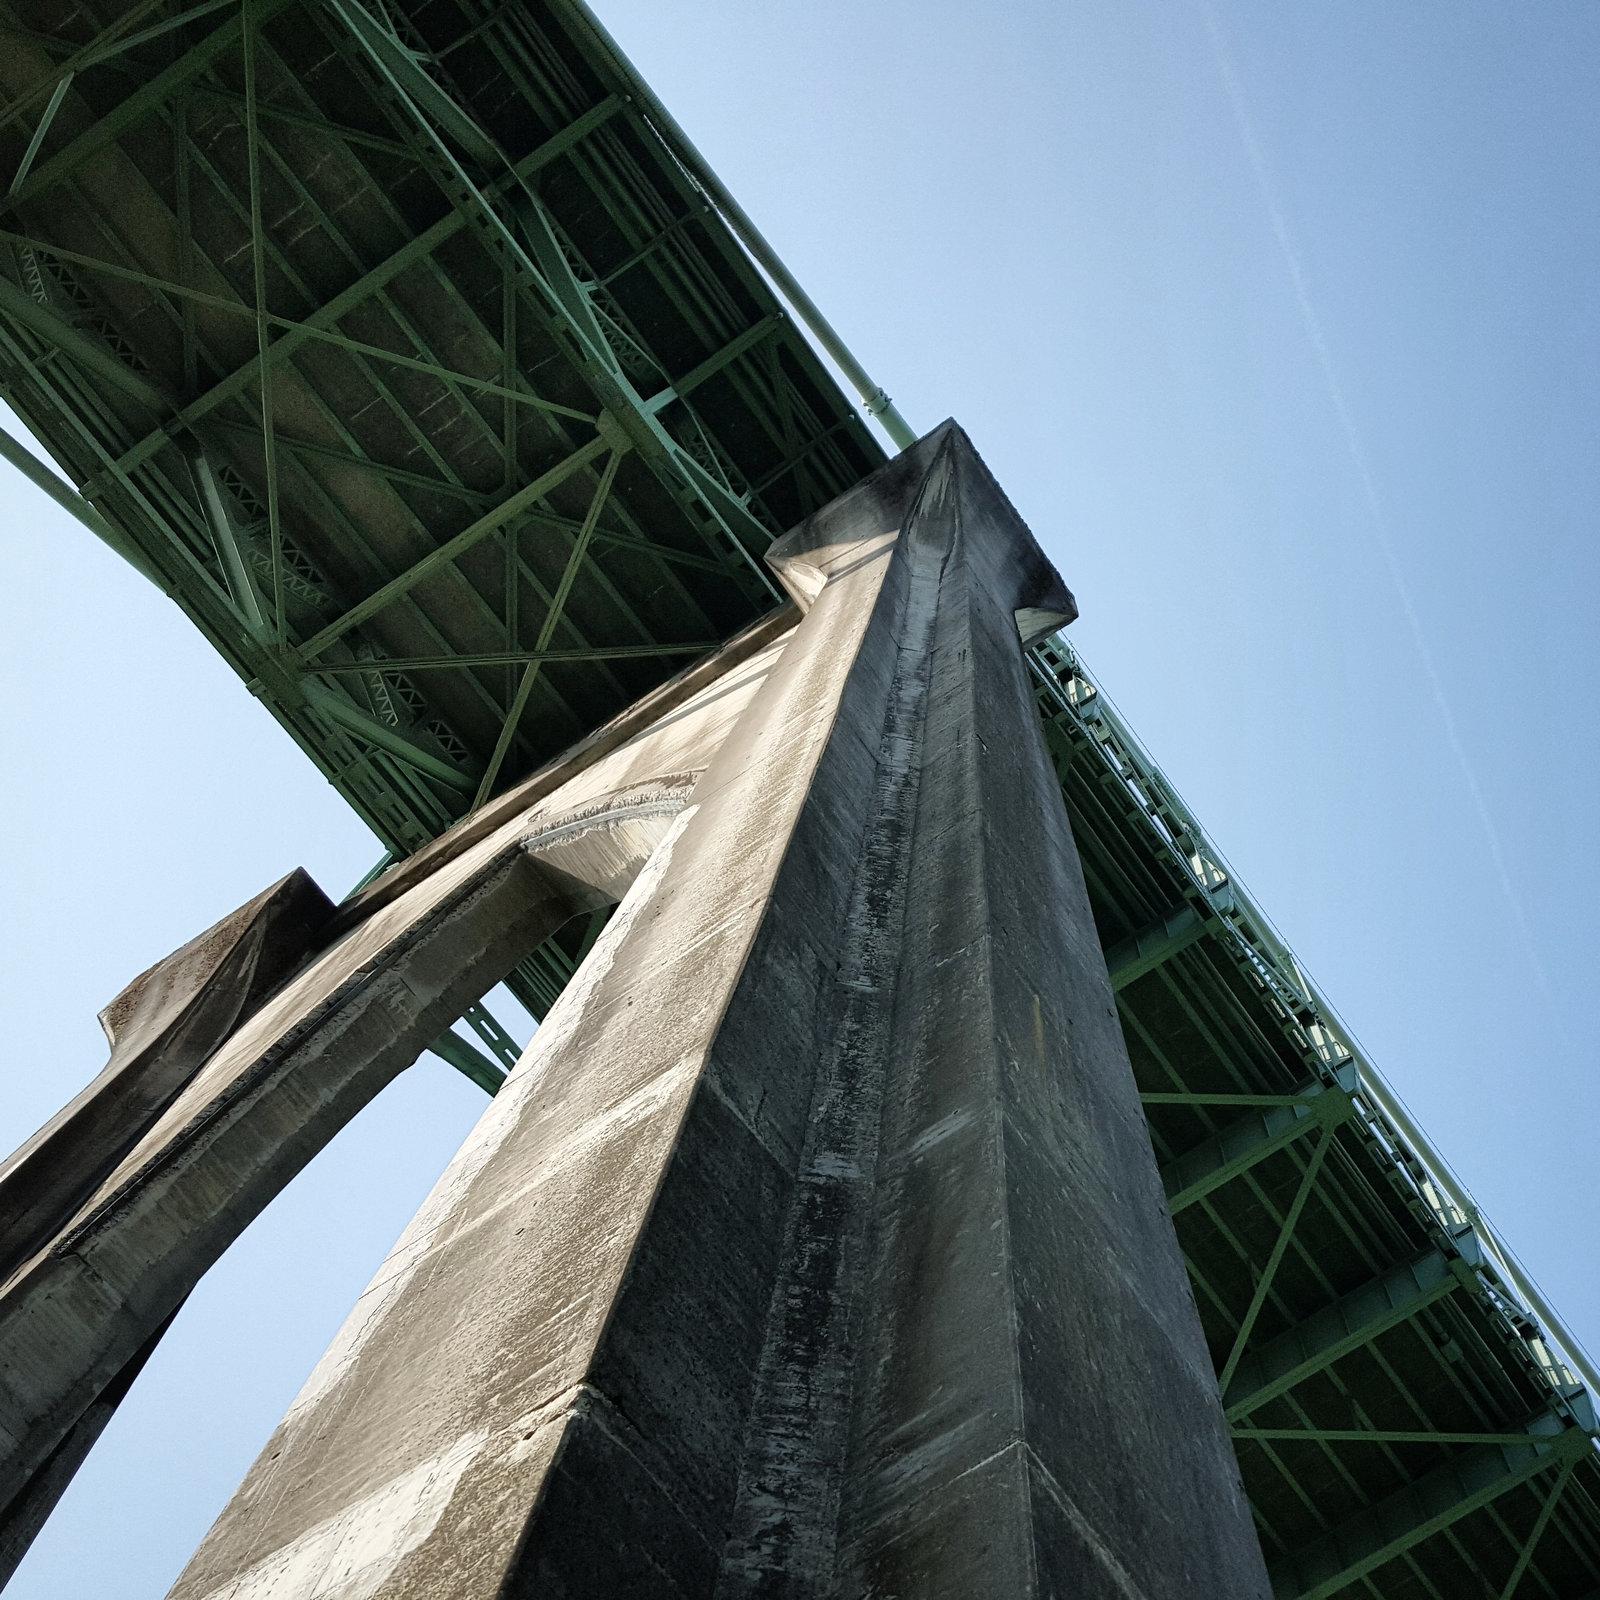 St. Johns Bridge Tower